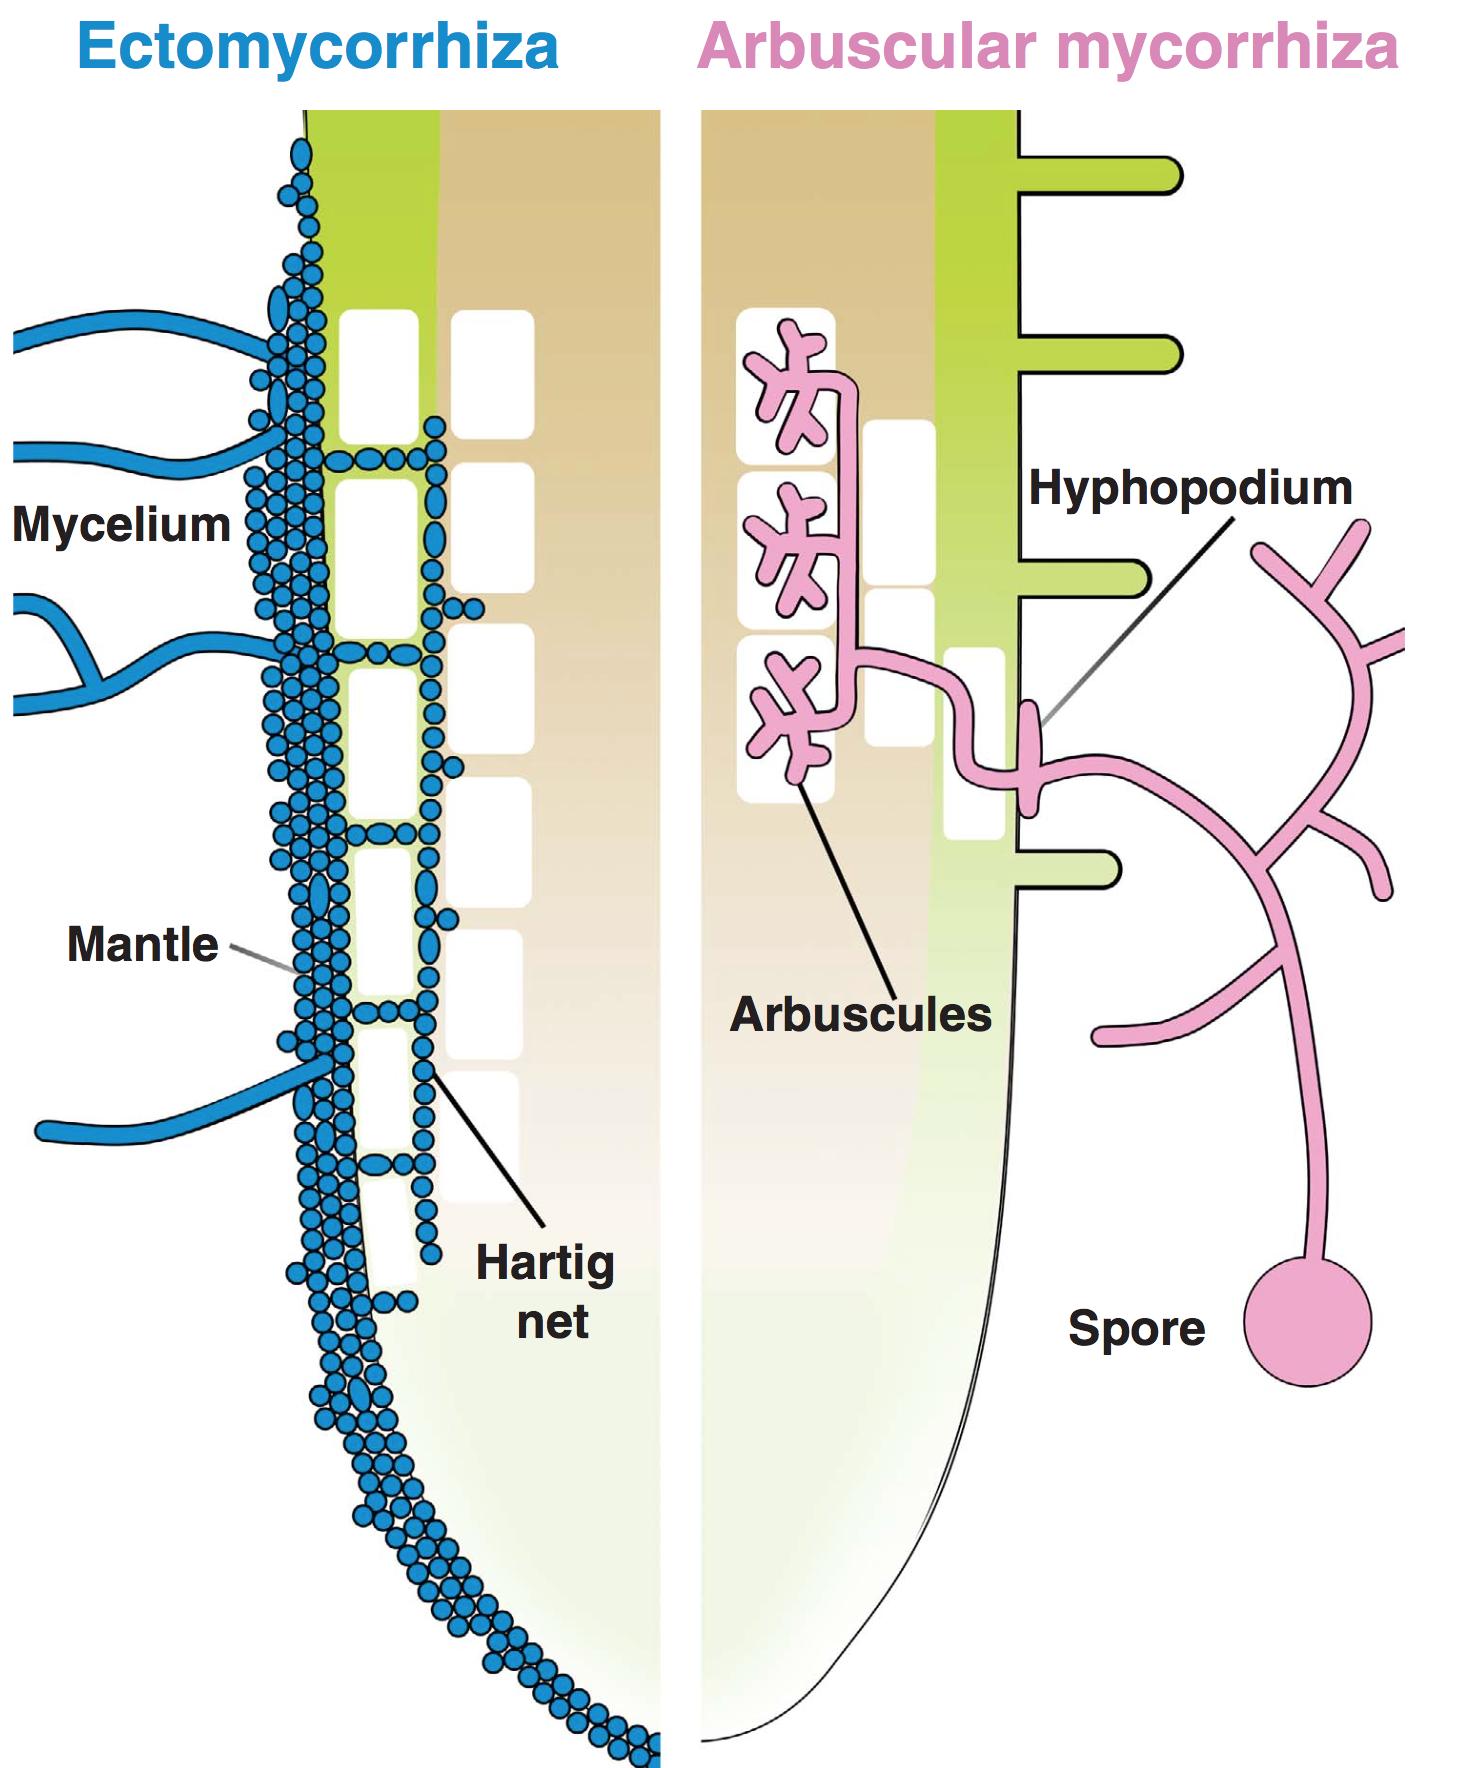 Two mycorrhizal types.  From Bonfante & Genre 2010 .